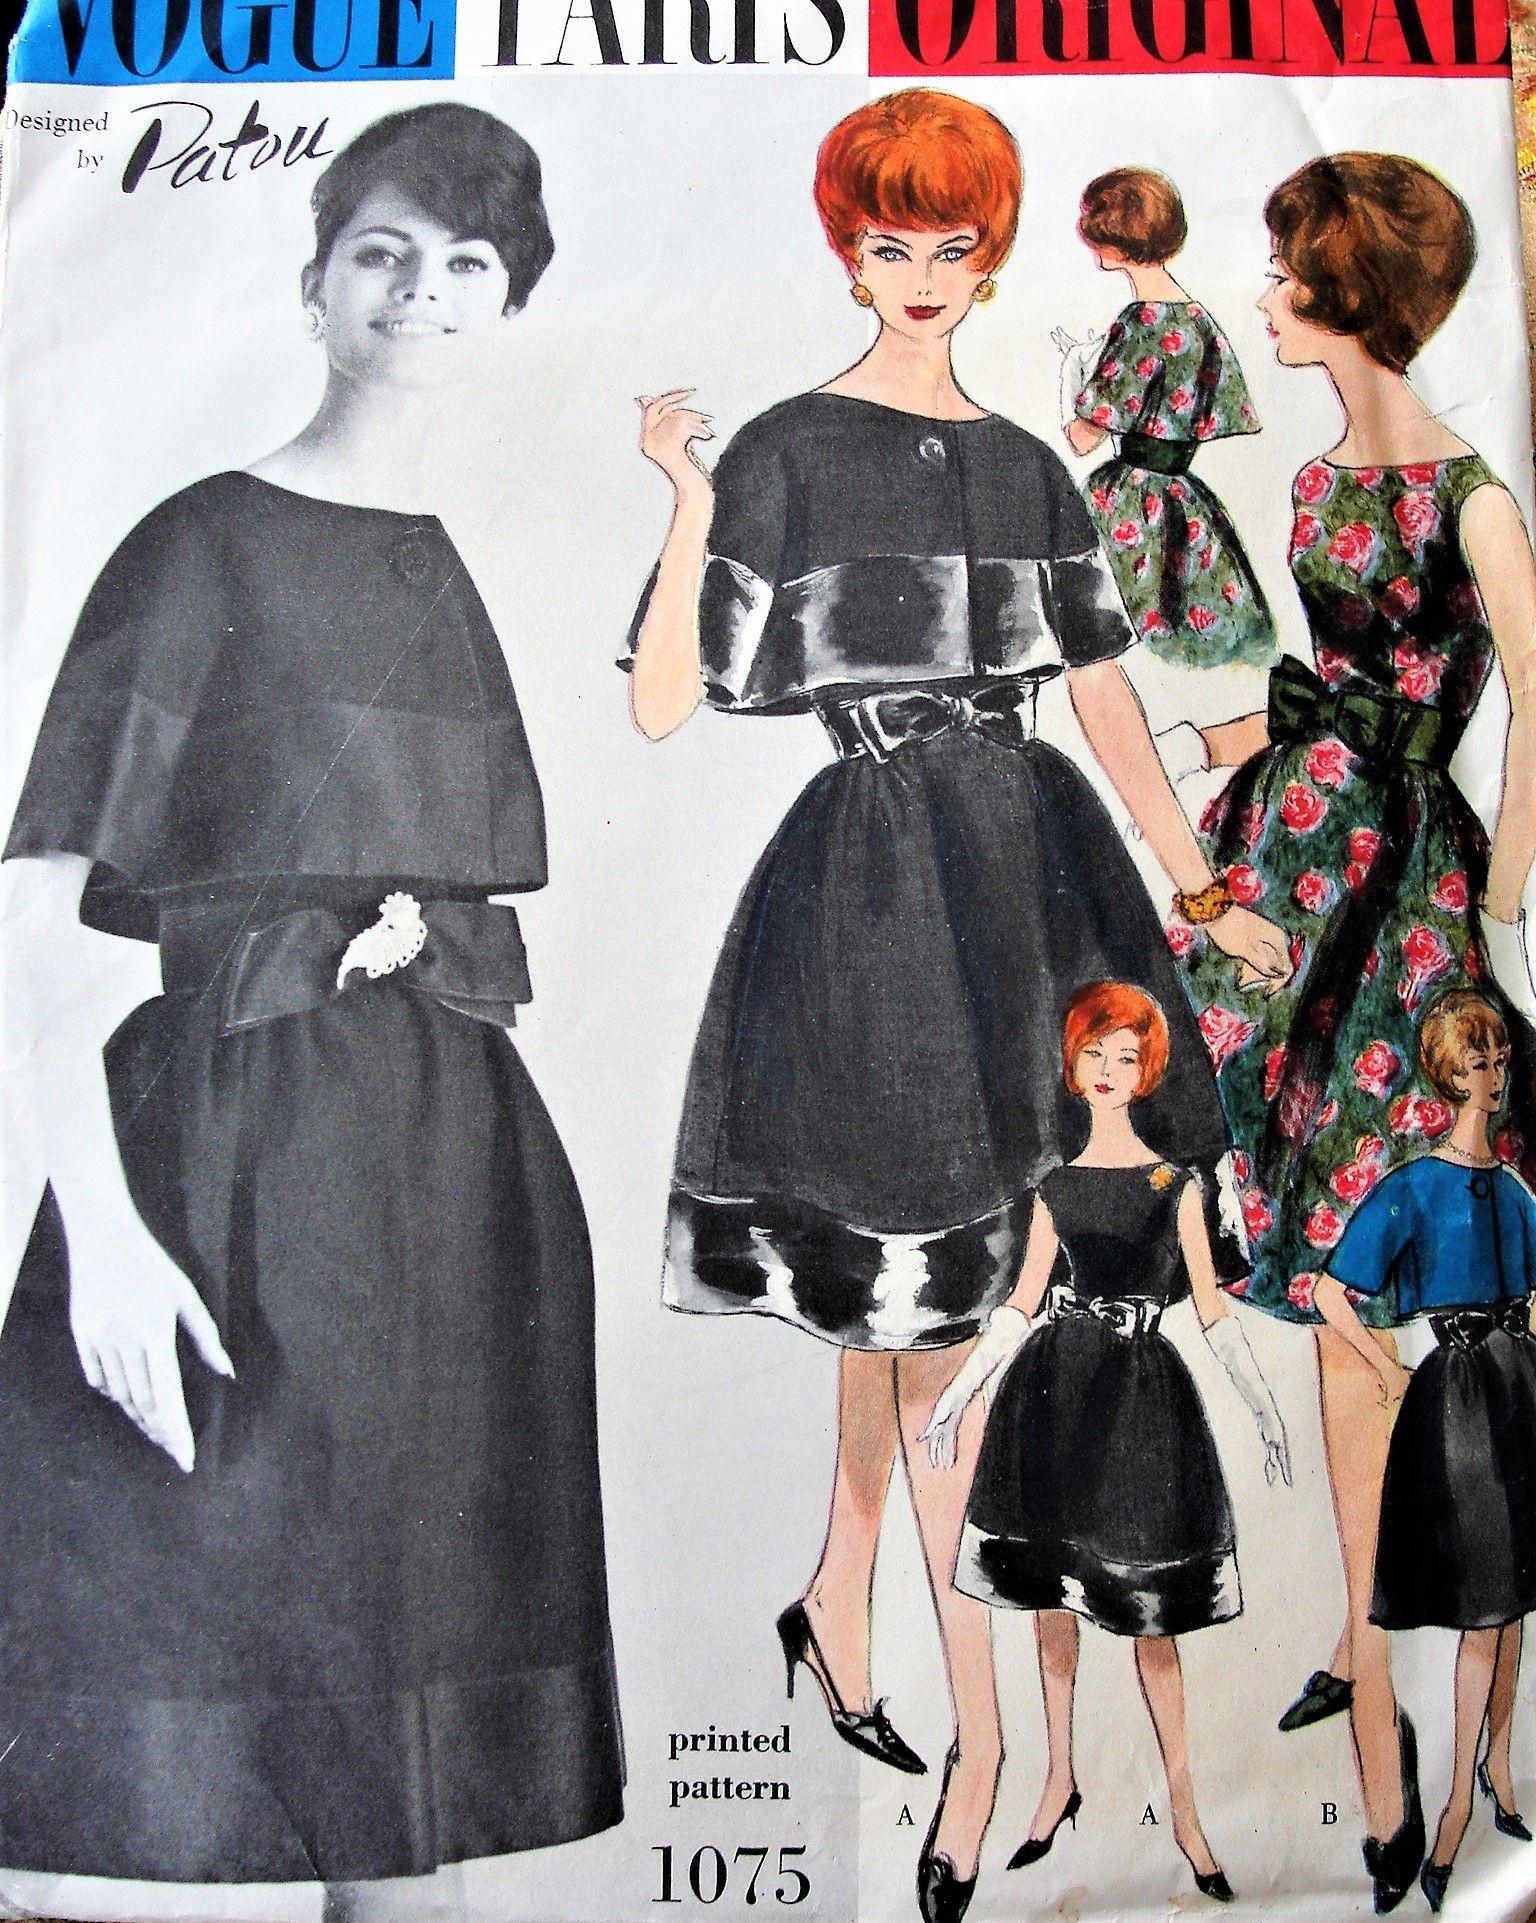 1960s Beautiful Patou Evening Cocktail Party Dress And Bolero Jacket Pattern Vogue Paris Ori Vintage Party Dresses Vintage Dresses 1960s Vintage Dresses Casual [ 1923 x 1536 Pixel ]